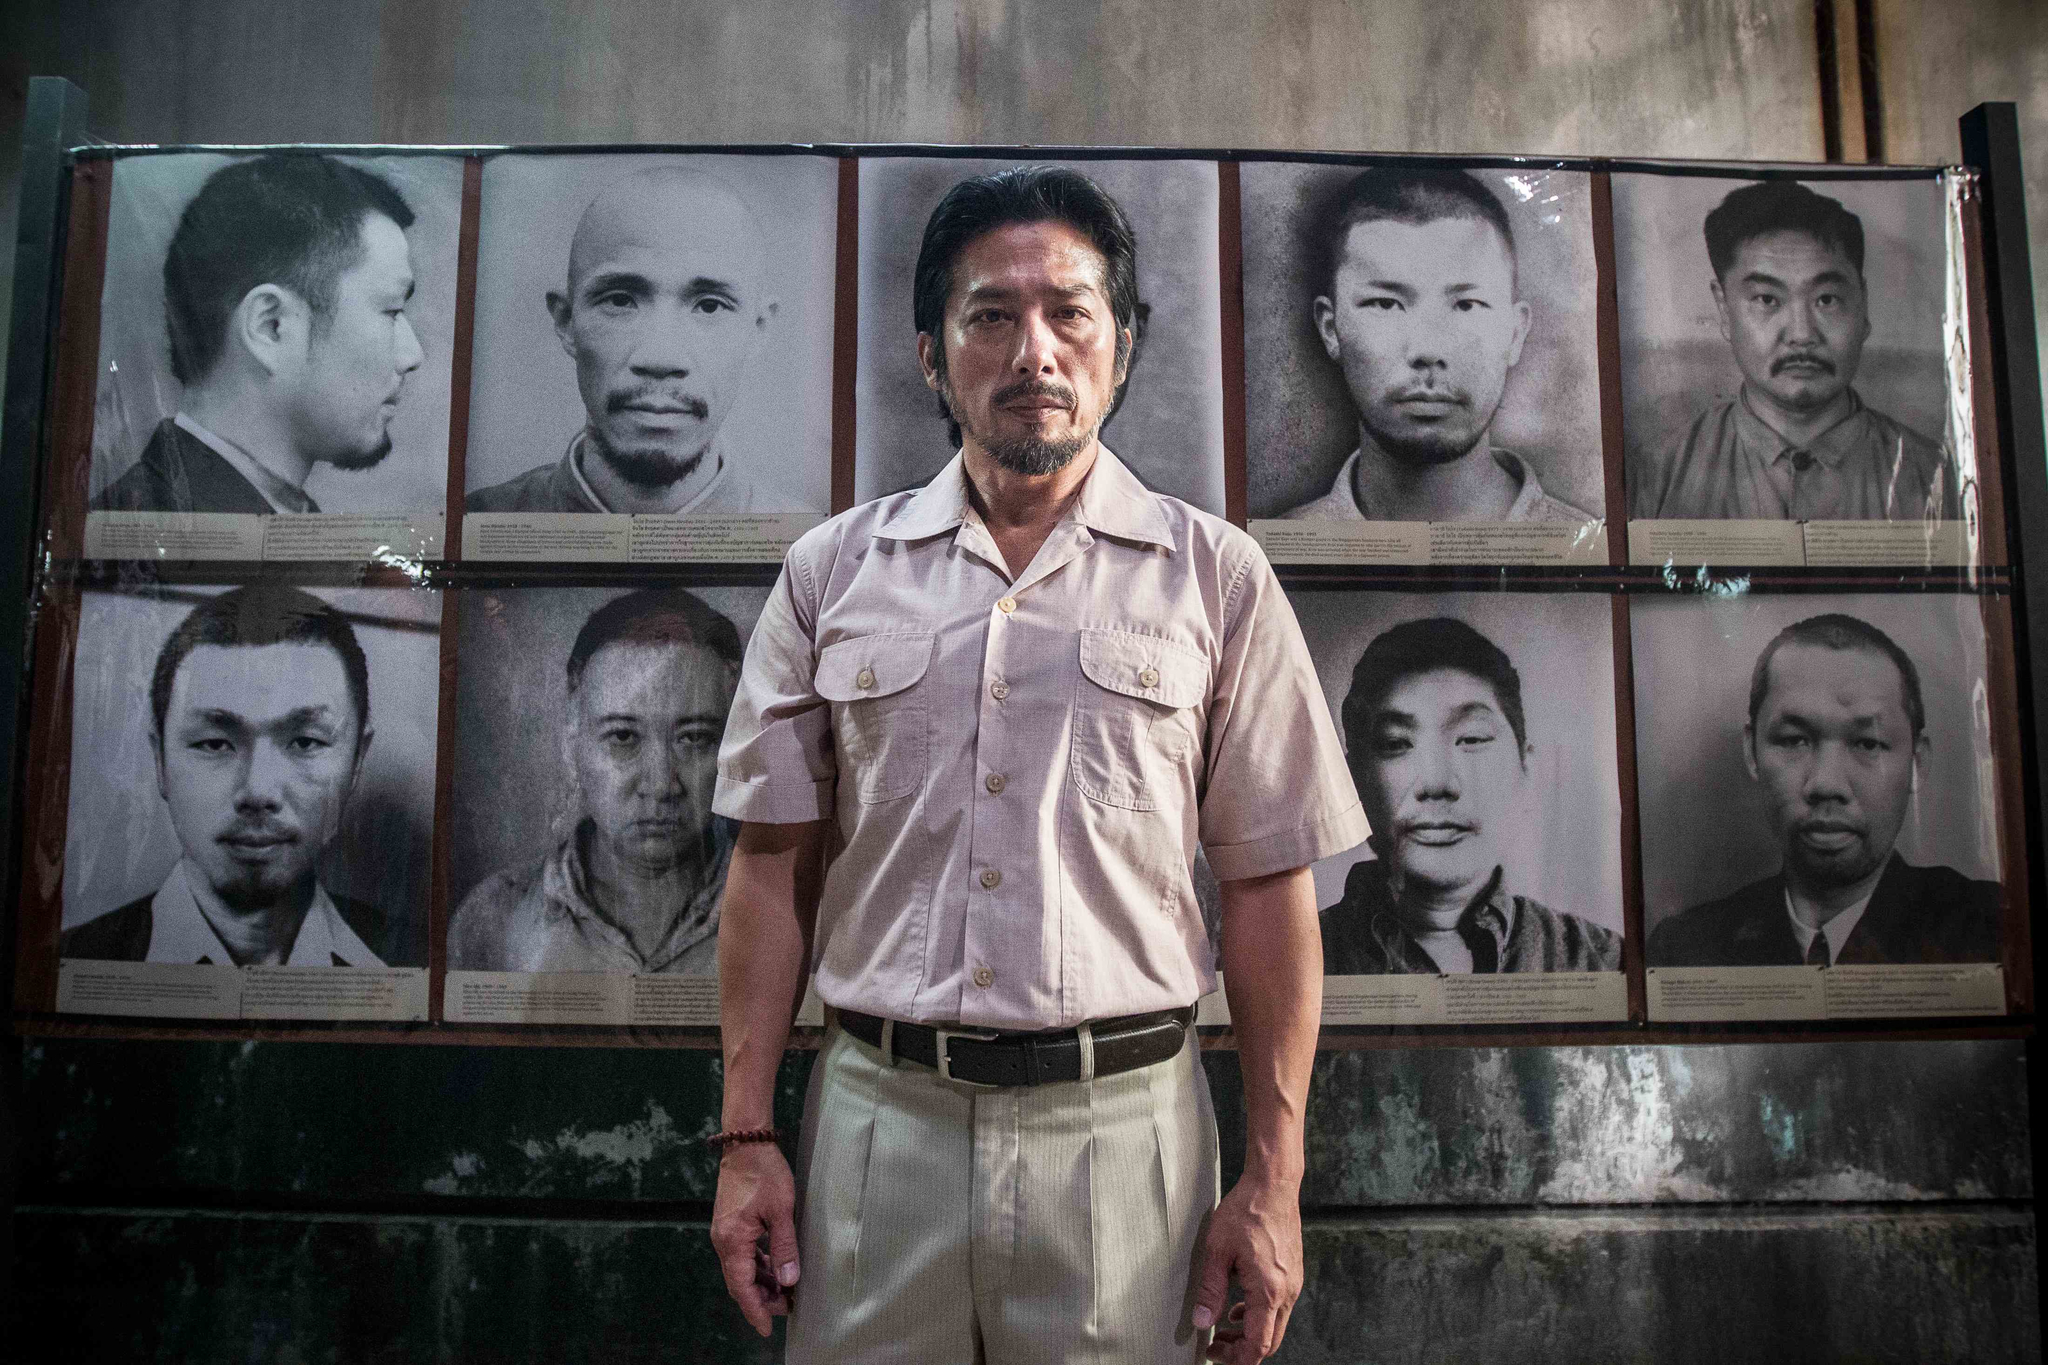 Hiroyuki Sanada in The Railway Man (2013)